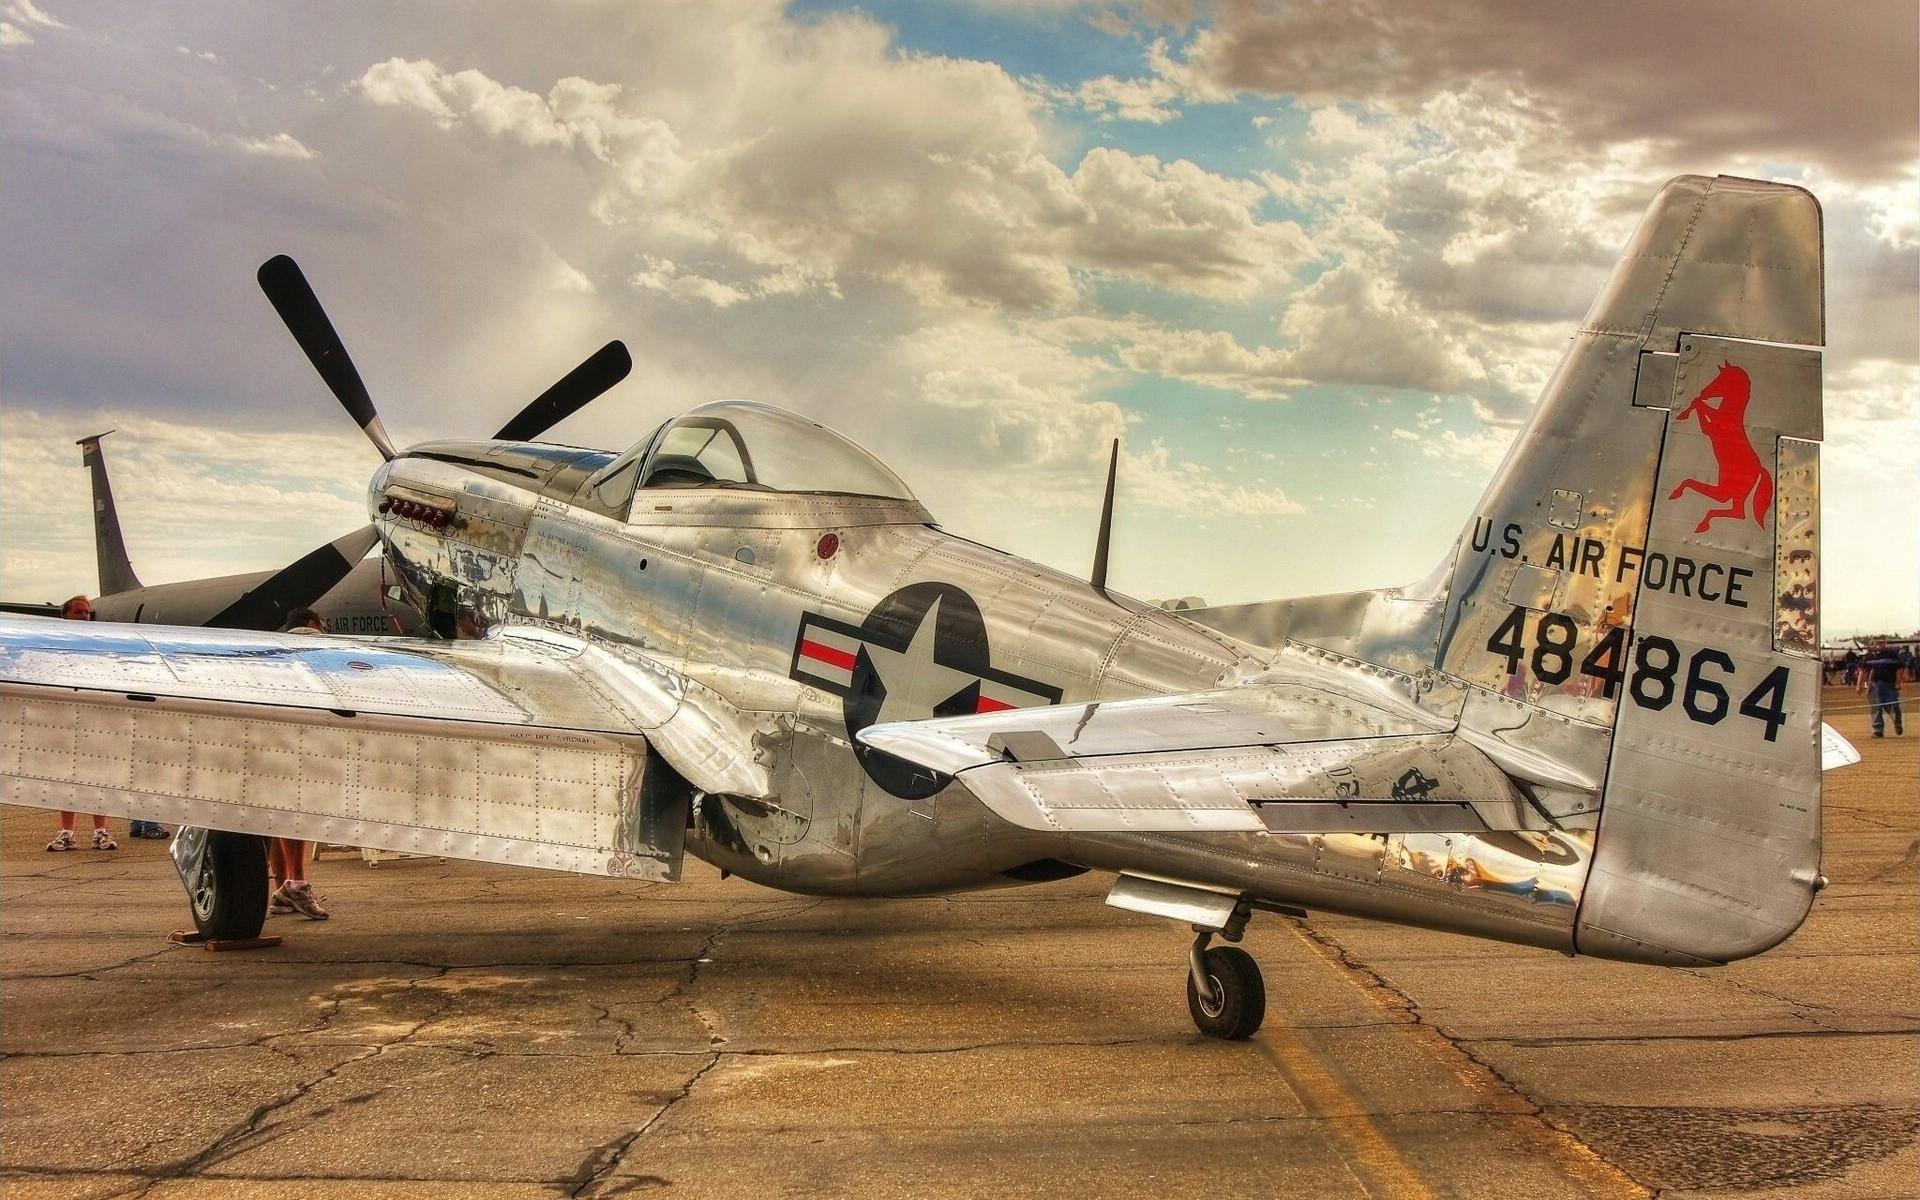 download vintage aviation wallpaper free #ub0l9 1920x1200 px